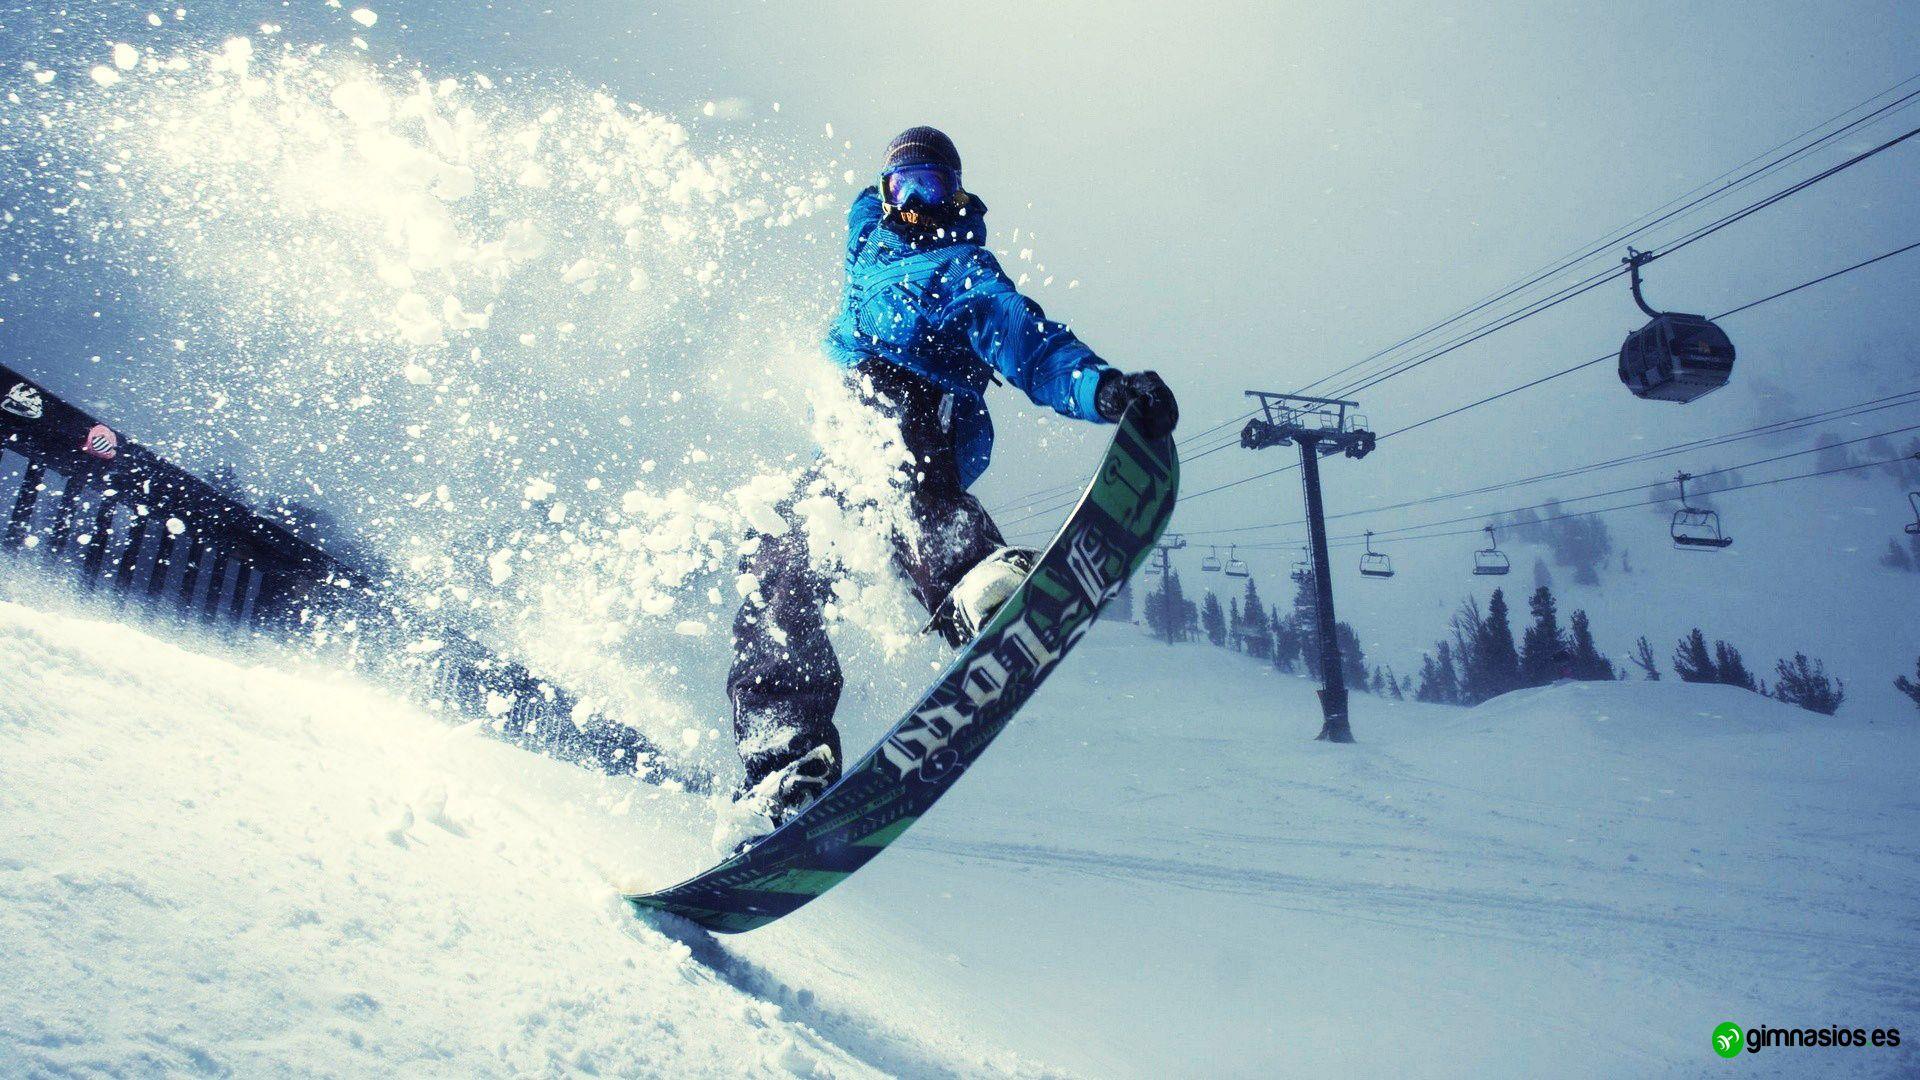 #freestyle #snowboarding #nieve #snow